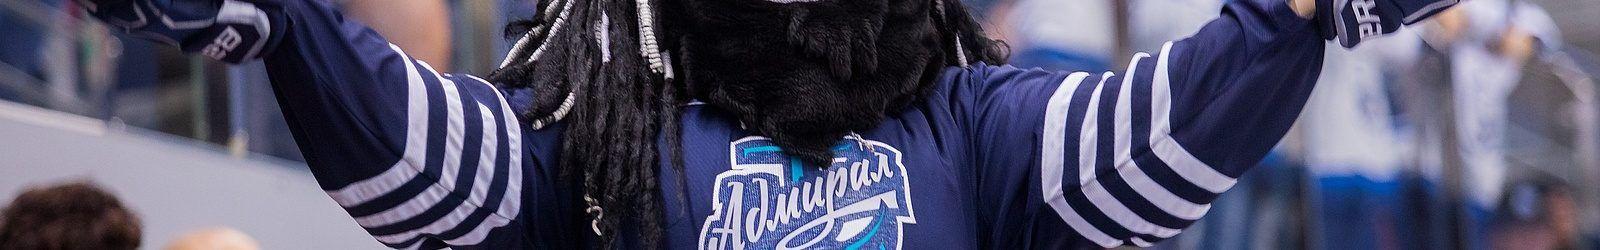 Хоккеисты «Адмирала» сенсационно победили «Авангард»